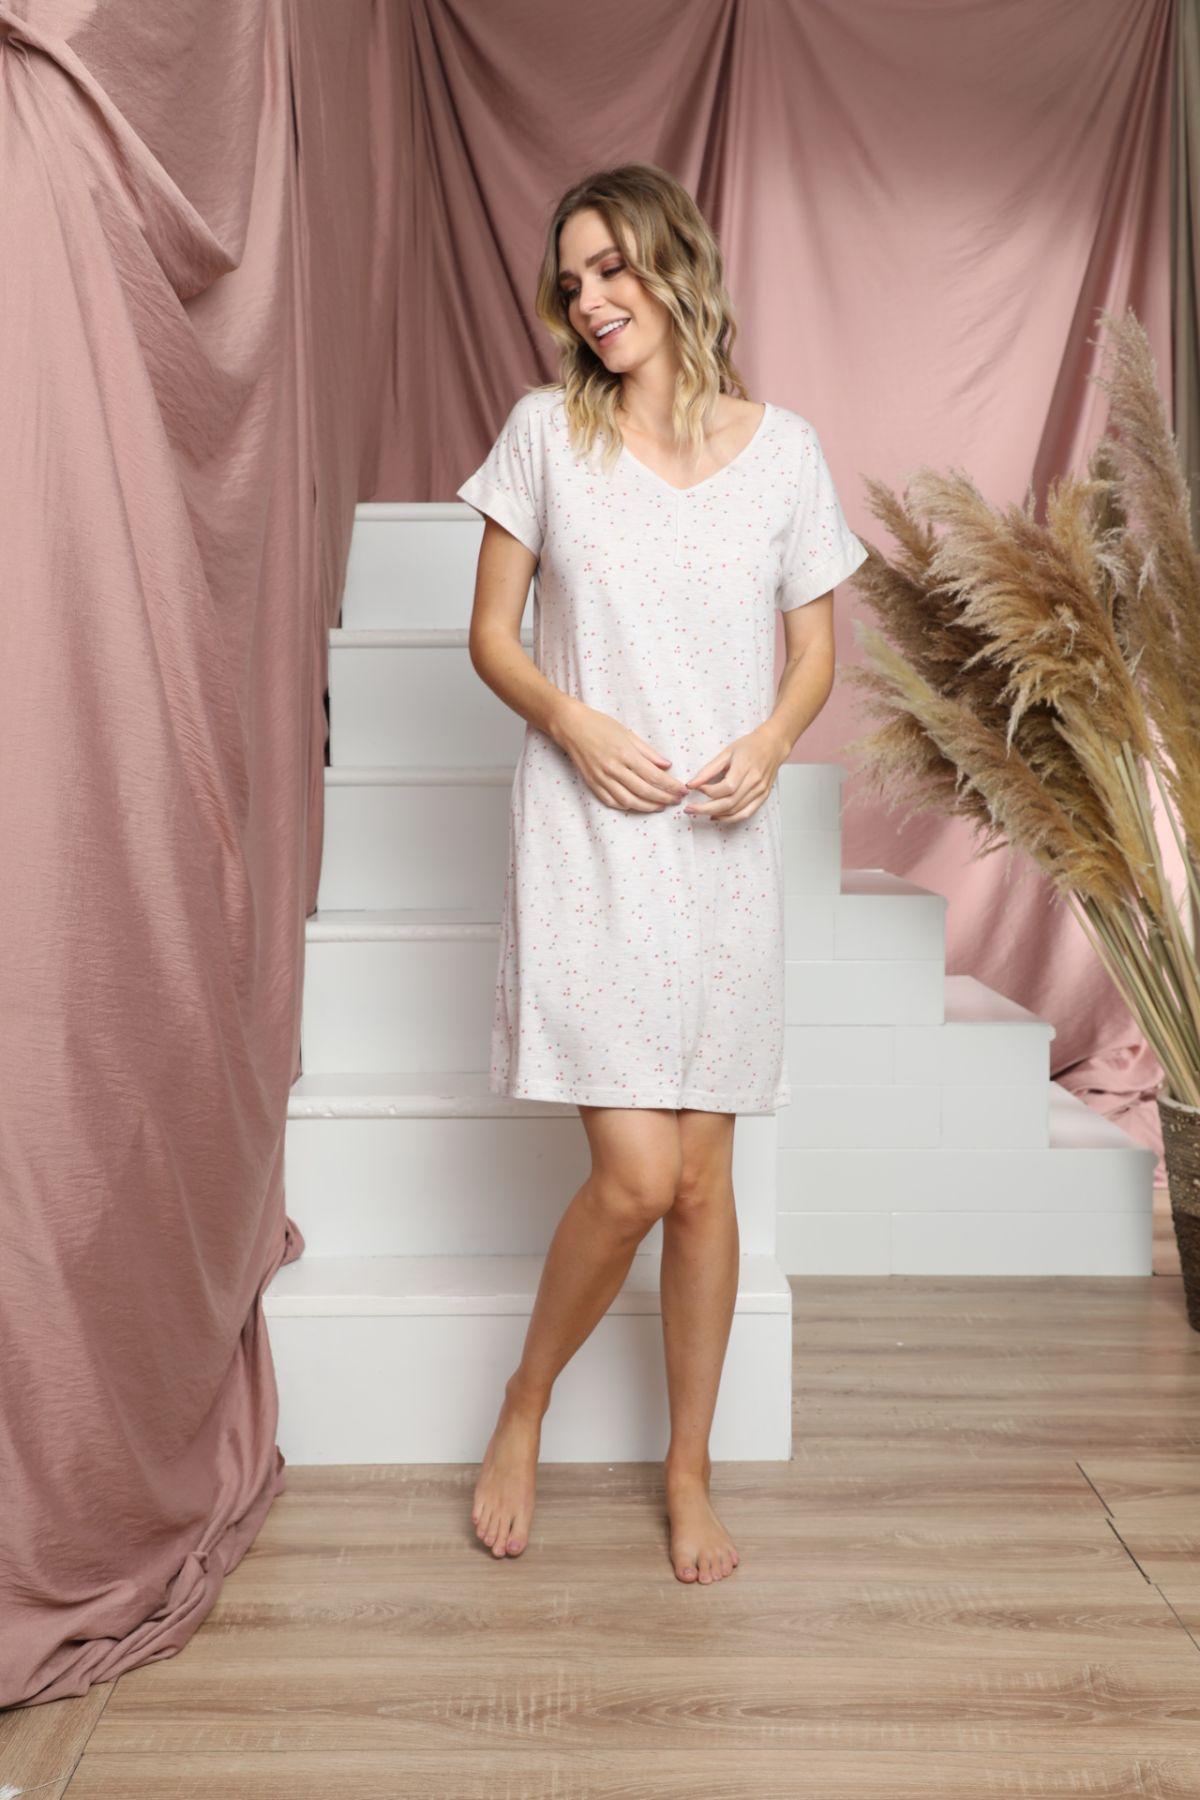 Kısa Kollu Pamuklu Likralı Elbise 21135505 - Thumbnail